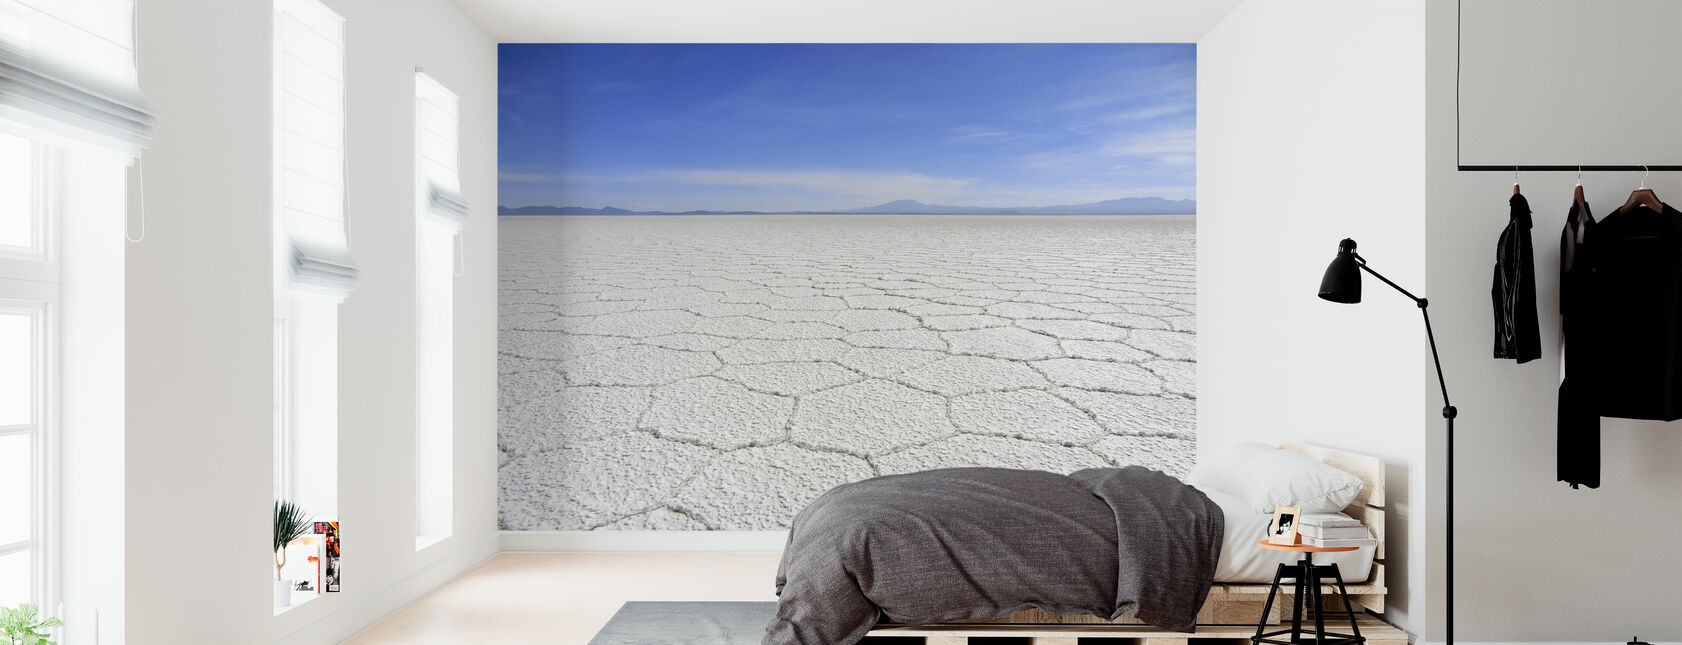 Suola-aavikko - Tapetti - Makuuhuone